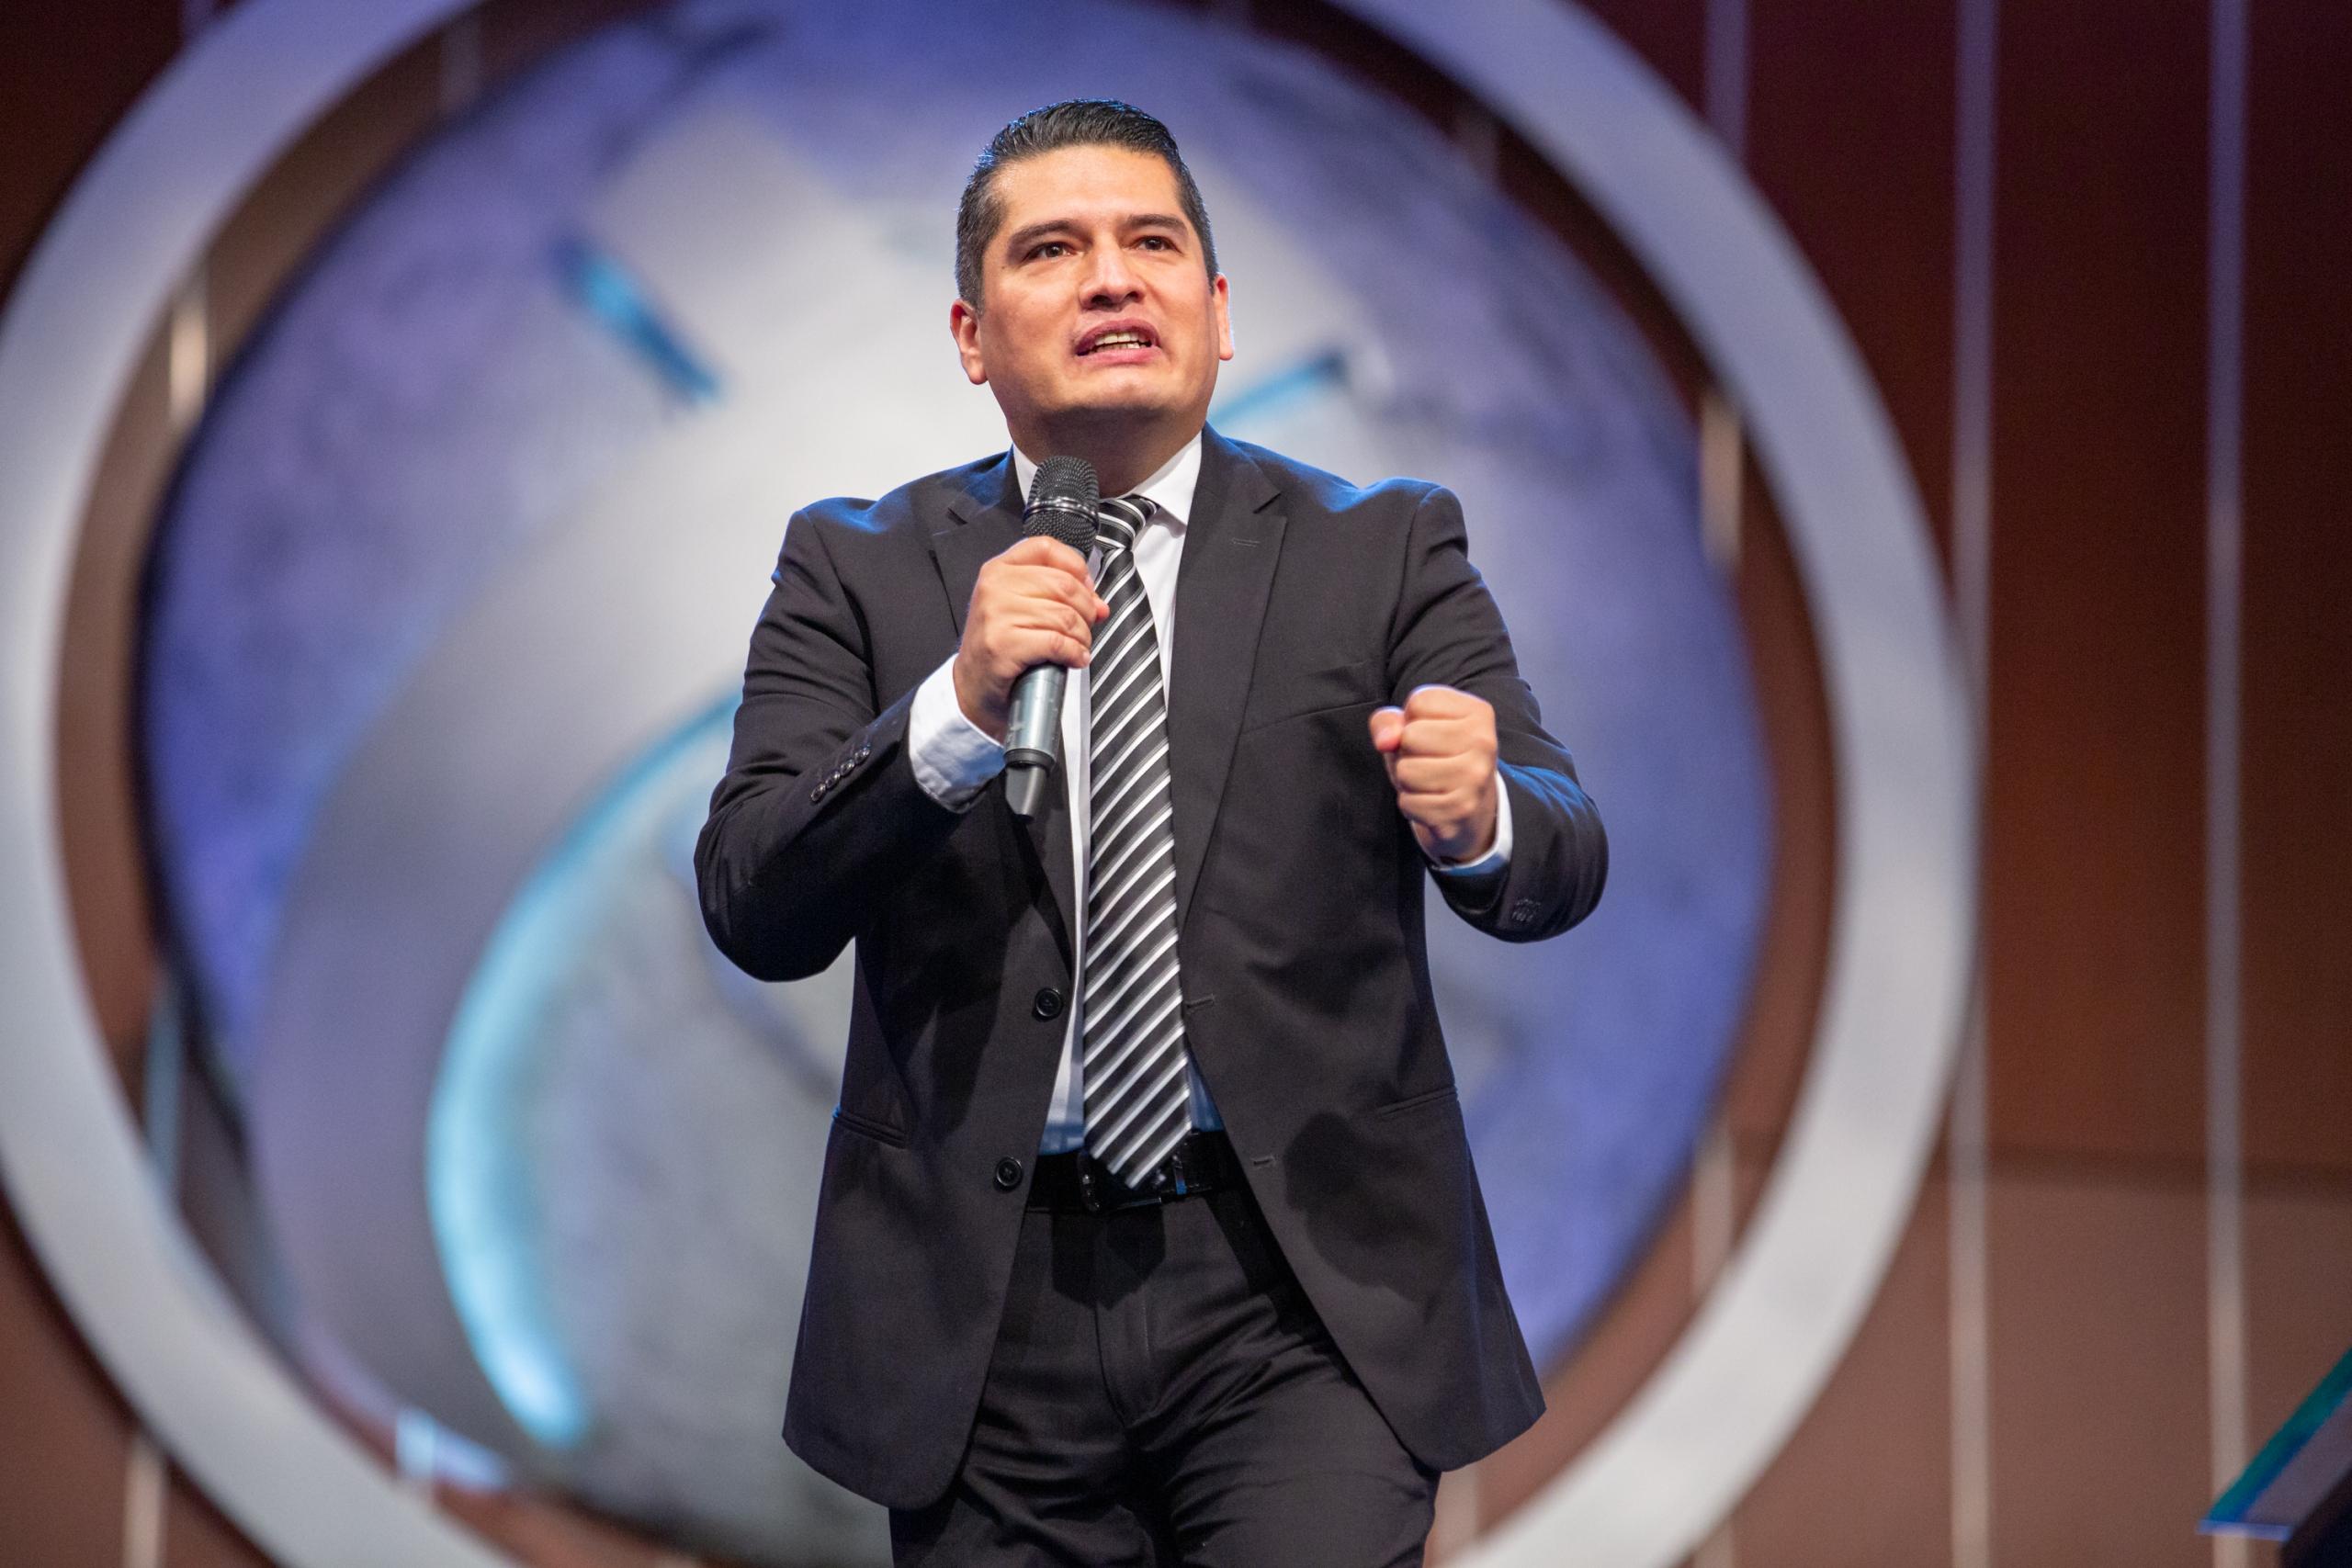 Pastor Yobany Blanco